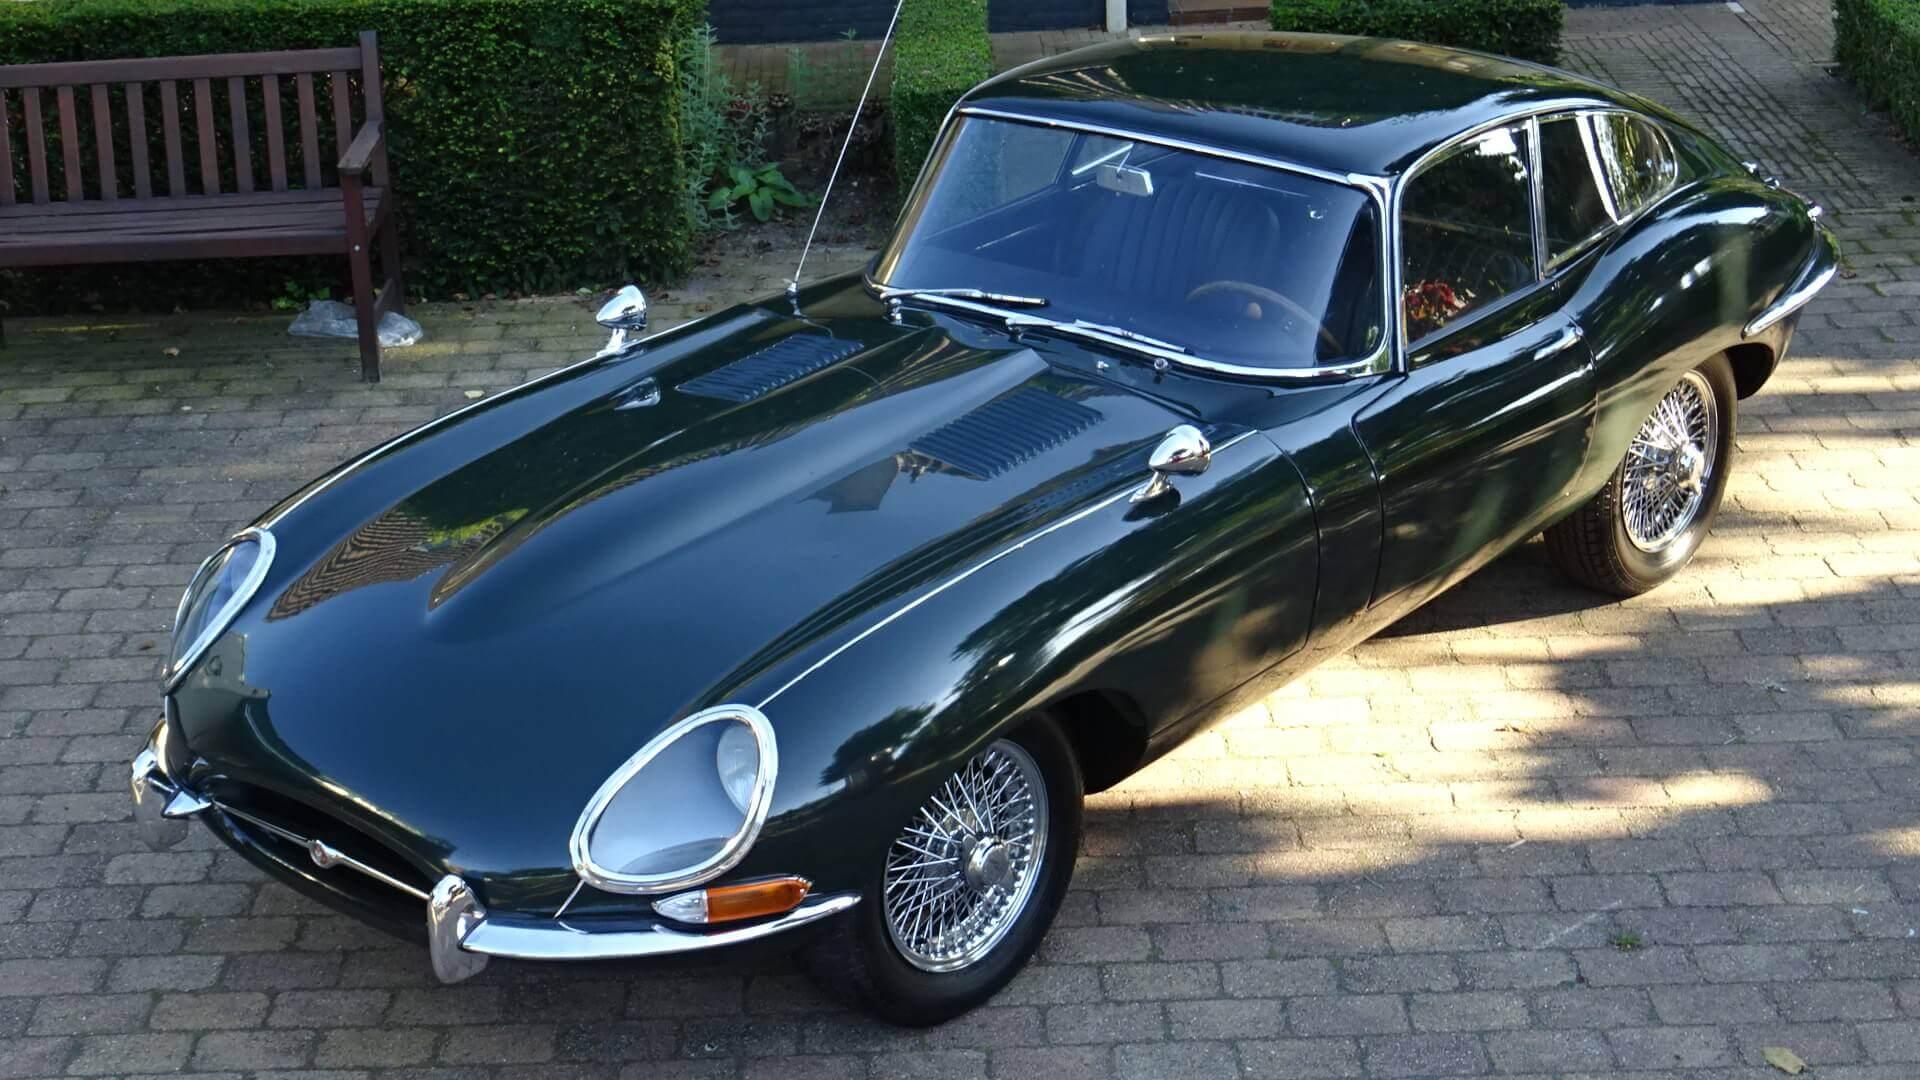 66 jaguar e type 4 2 coupe serie 1 union jack vintage cars. Black Bedroom Furniture Sets. Home Design Ideas